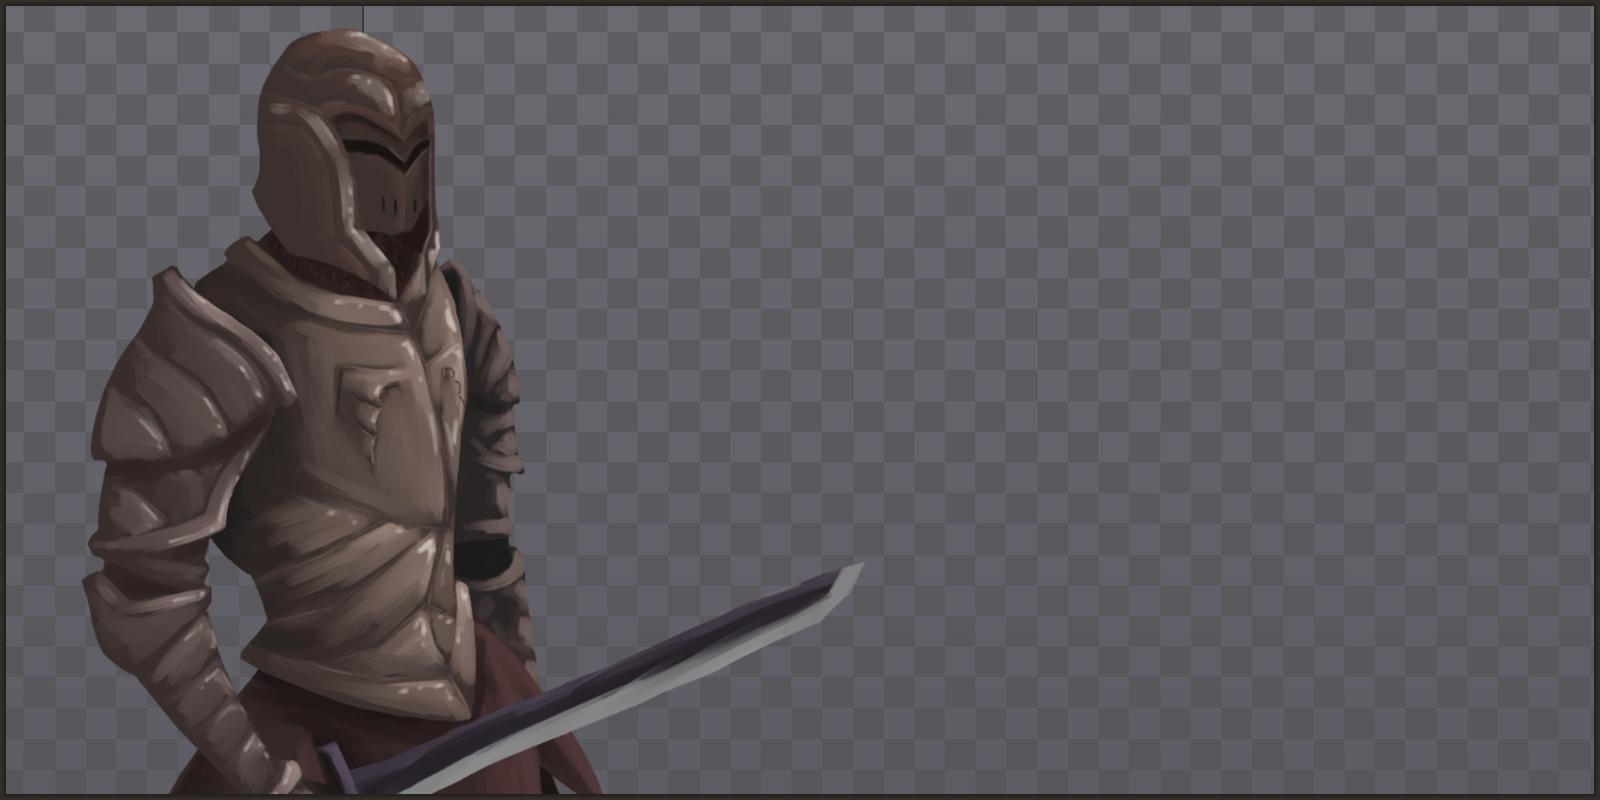 progress 8 - black knight